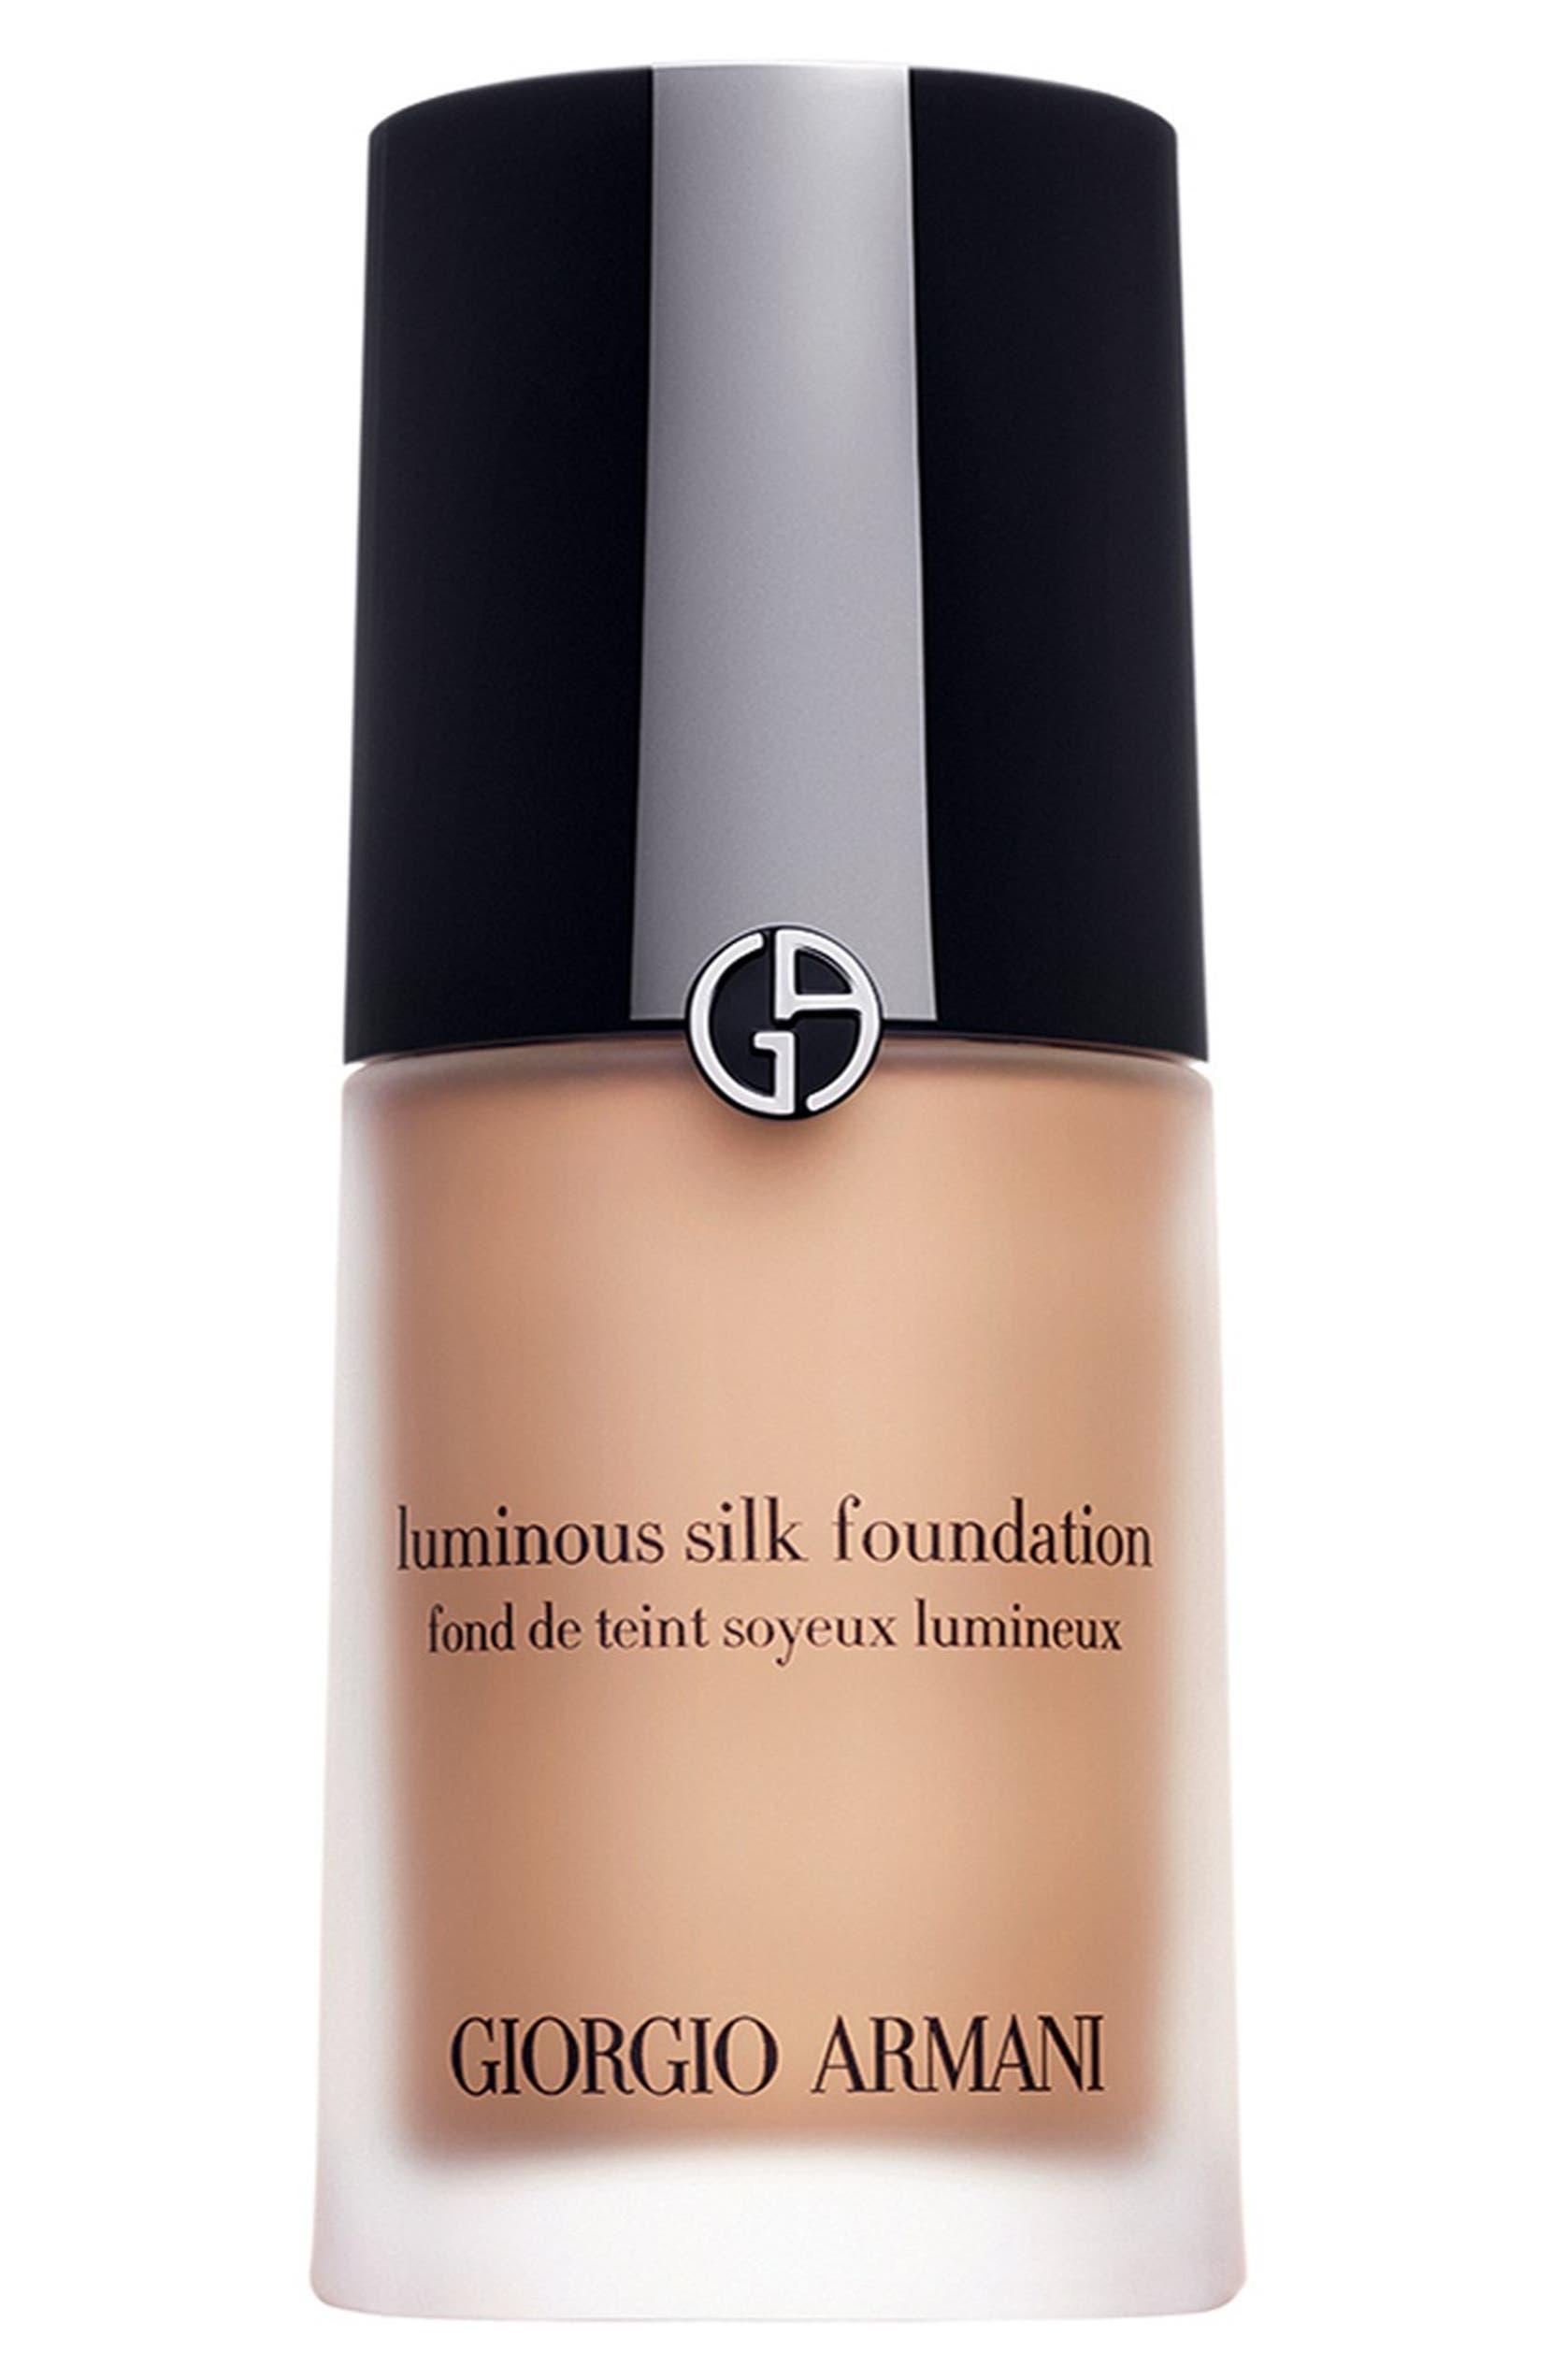 Image result for giorgio armani luminous silk foundation shade 7